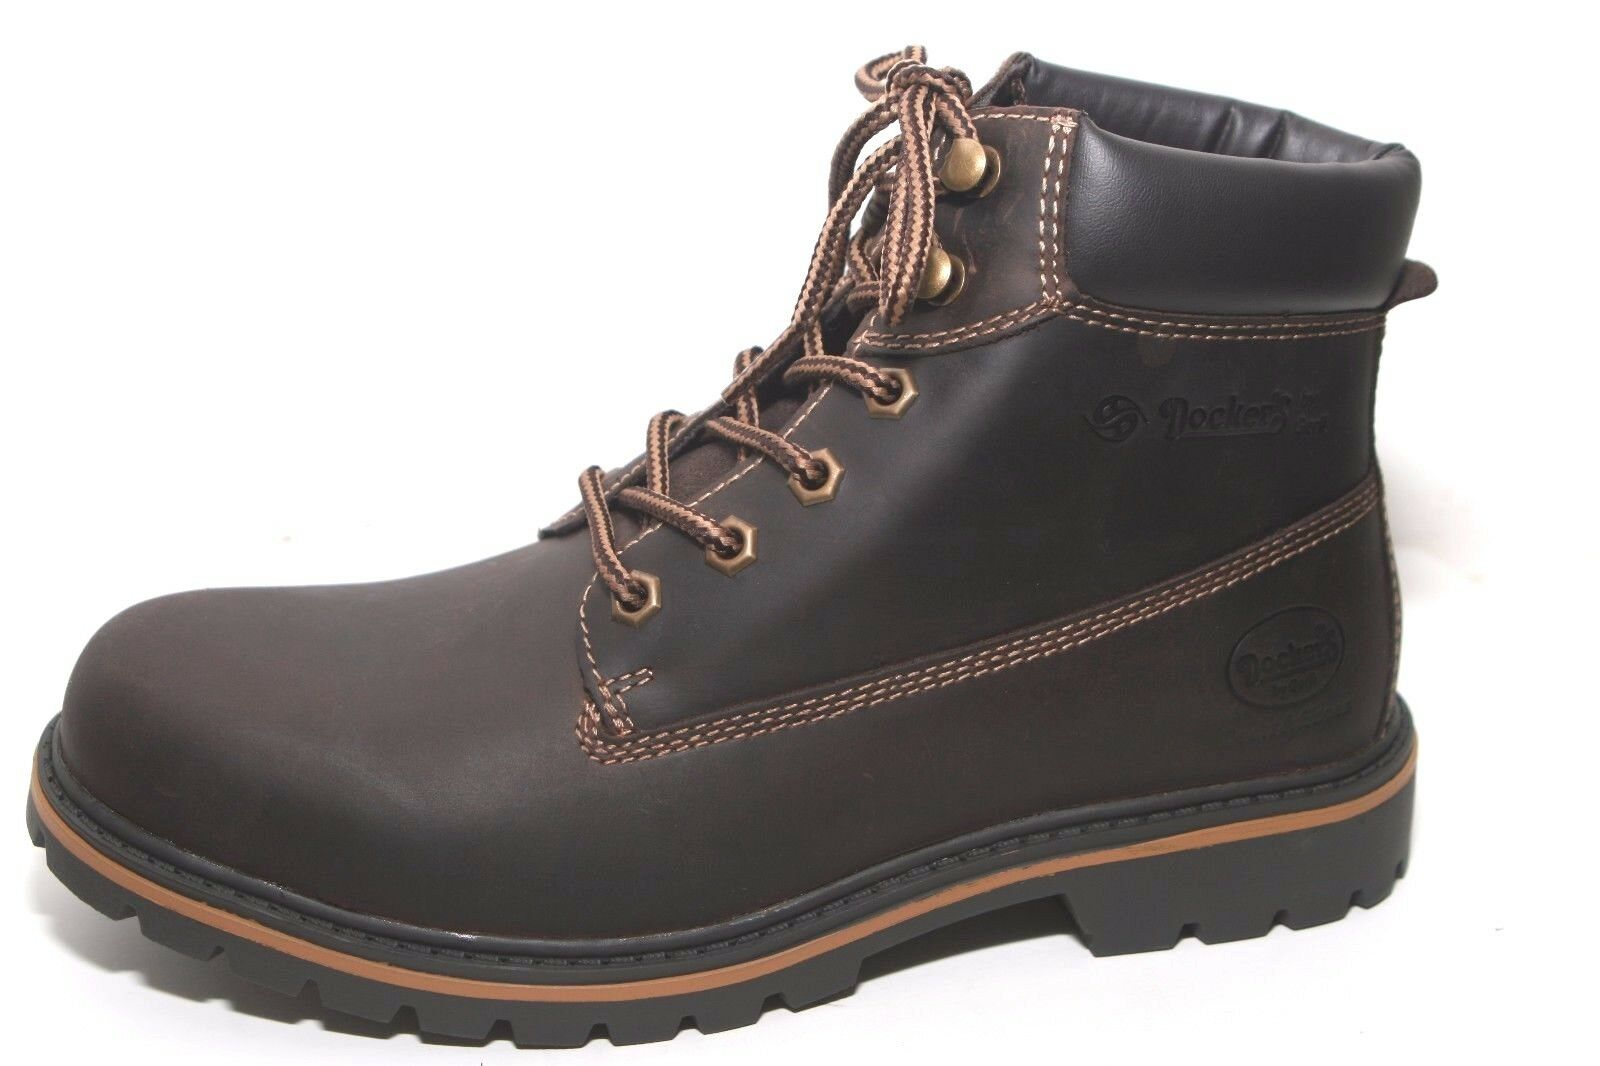 Dockers Boots Wanderschuhe Stiefel braun Warmfutter- Kunstfell Leder Herren